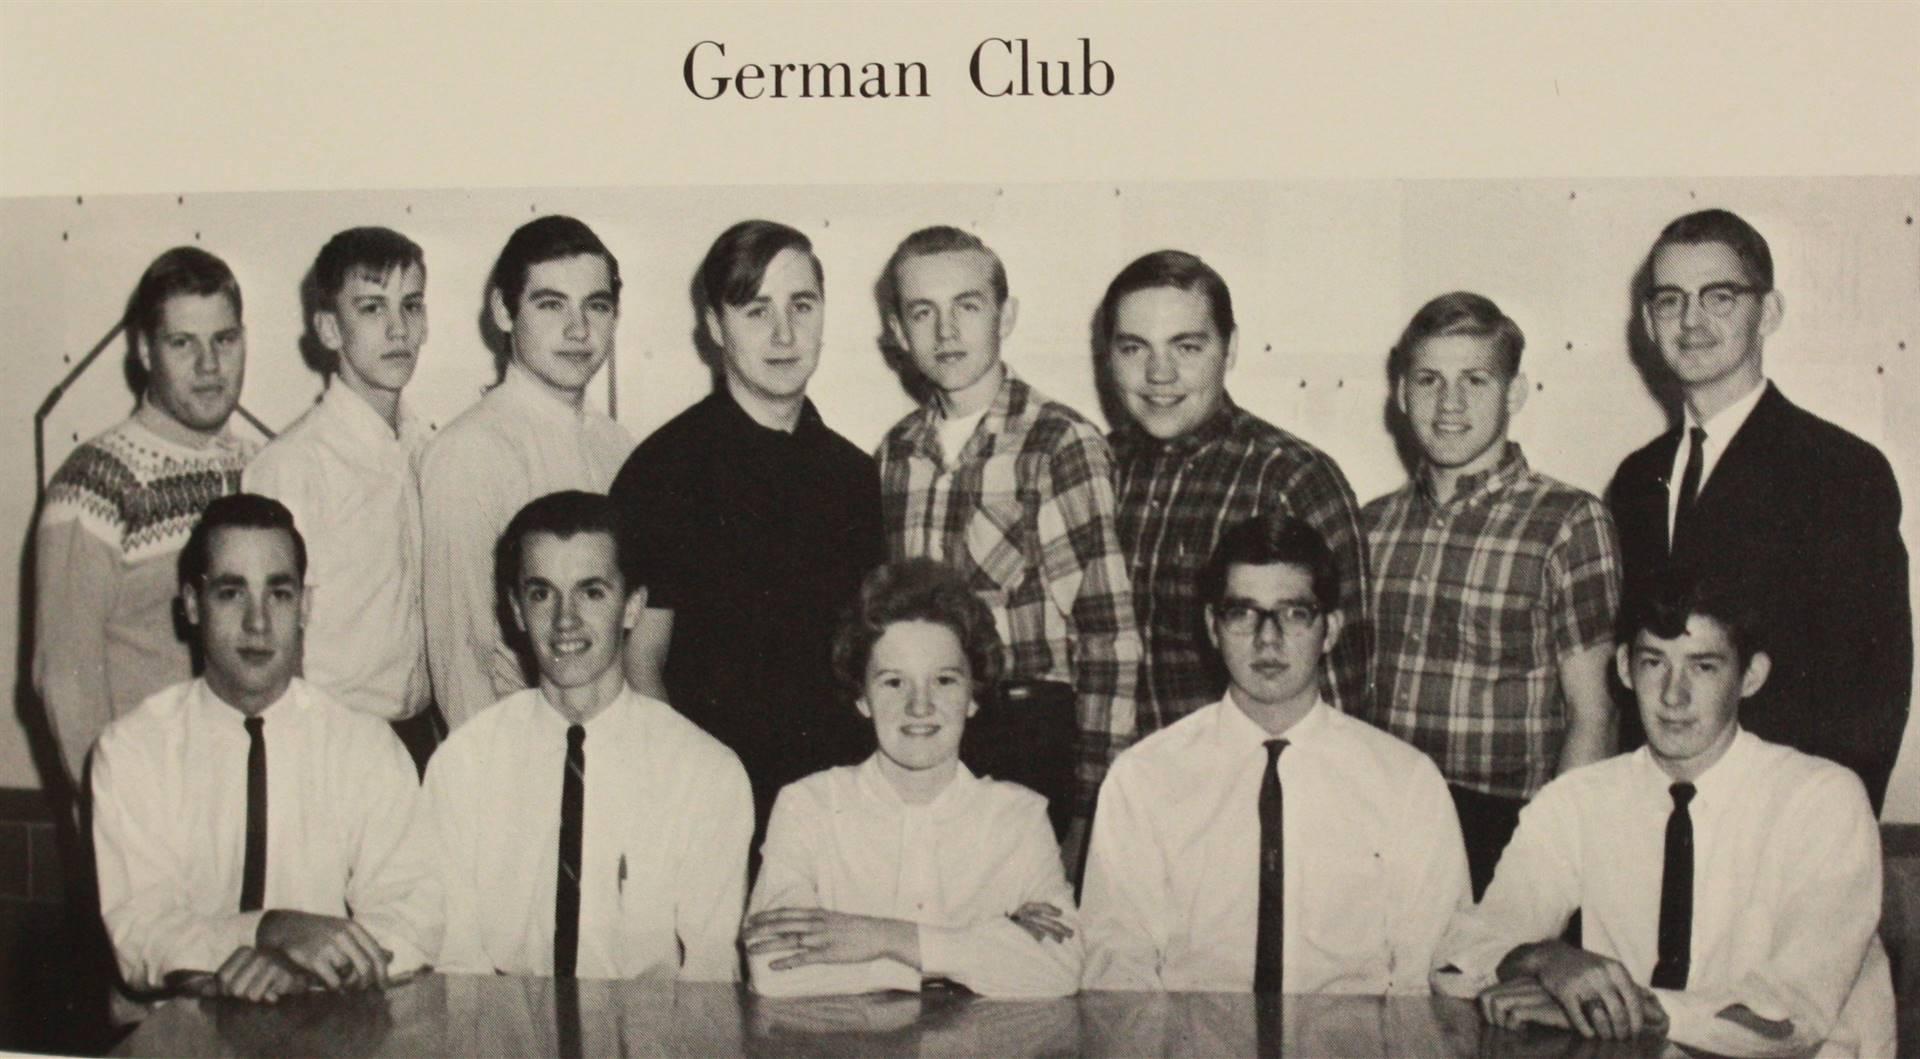 1966 German Club